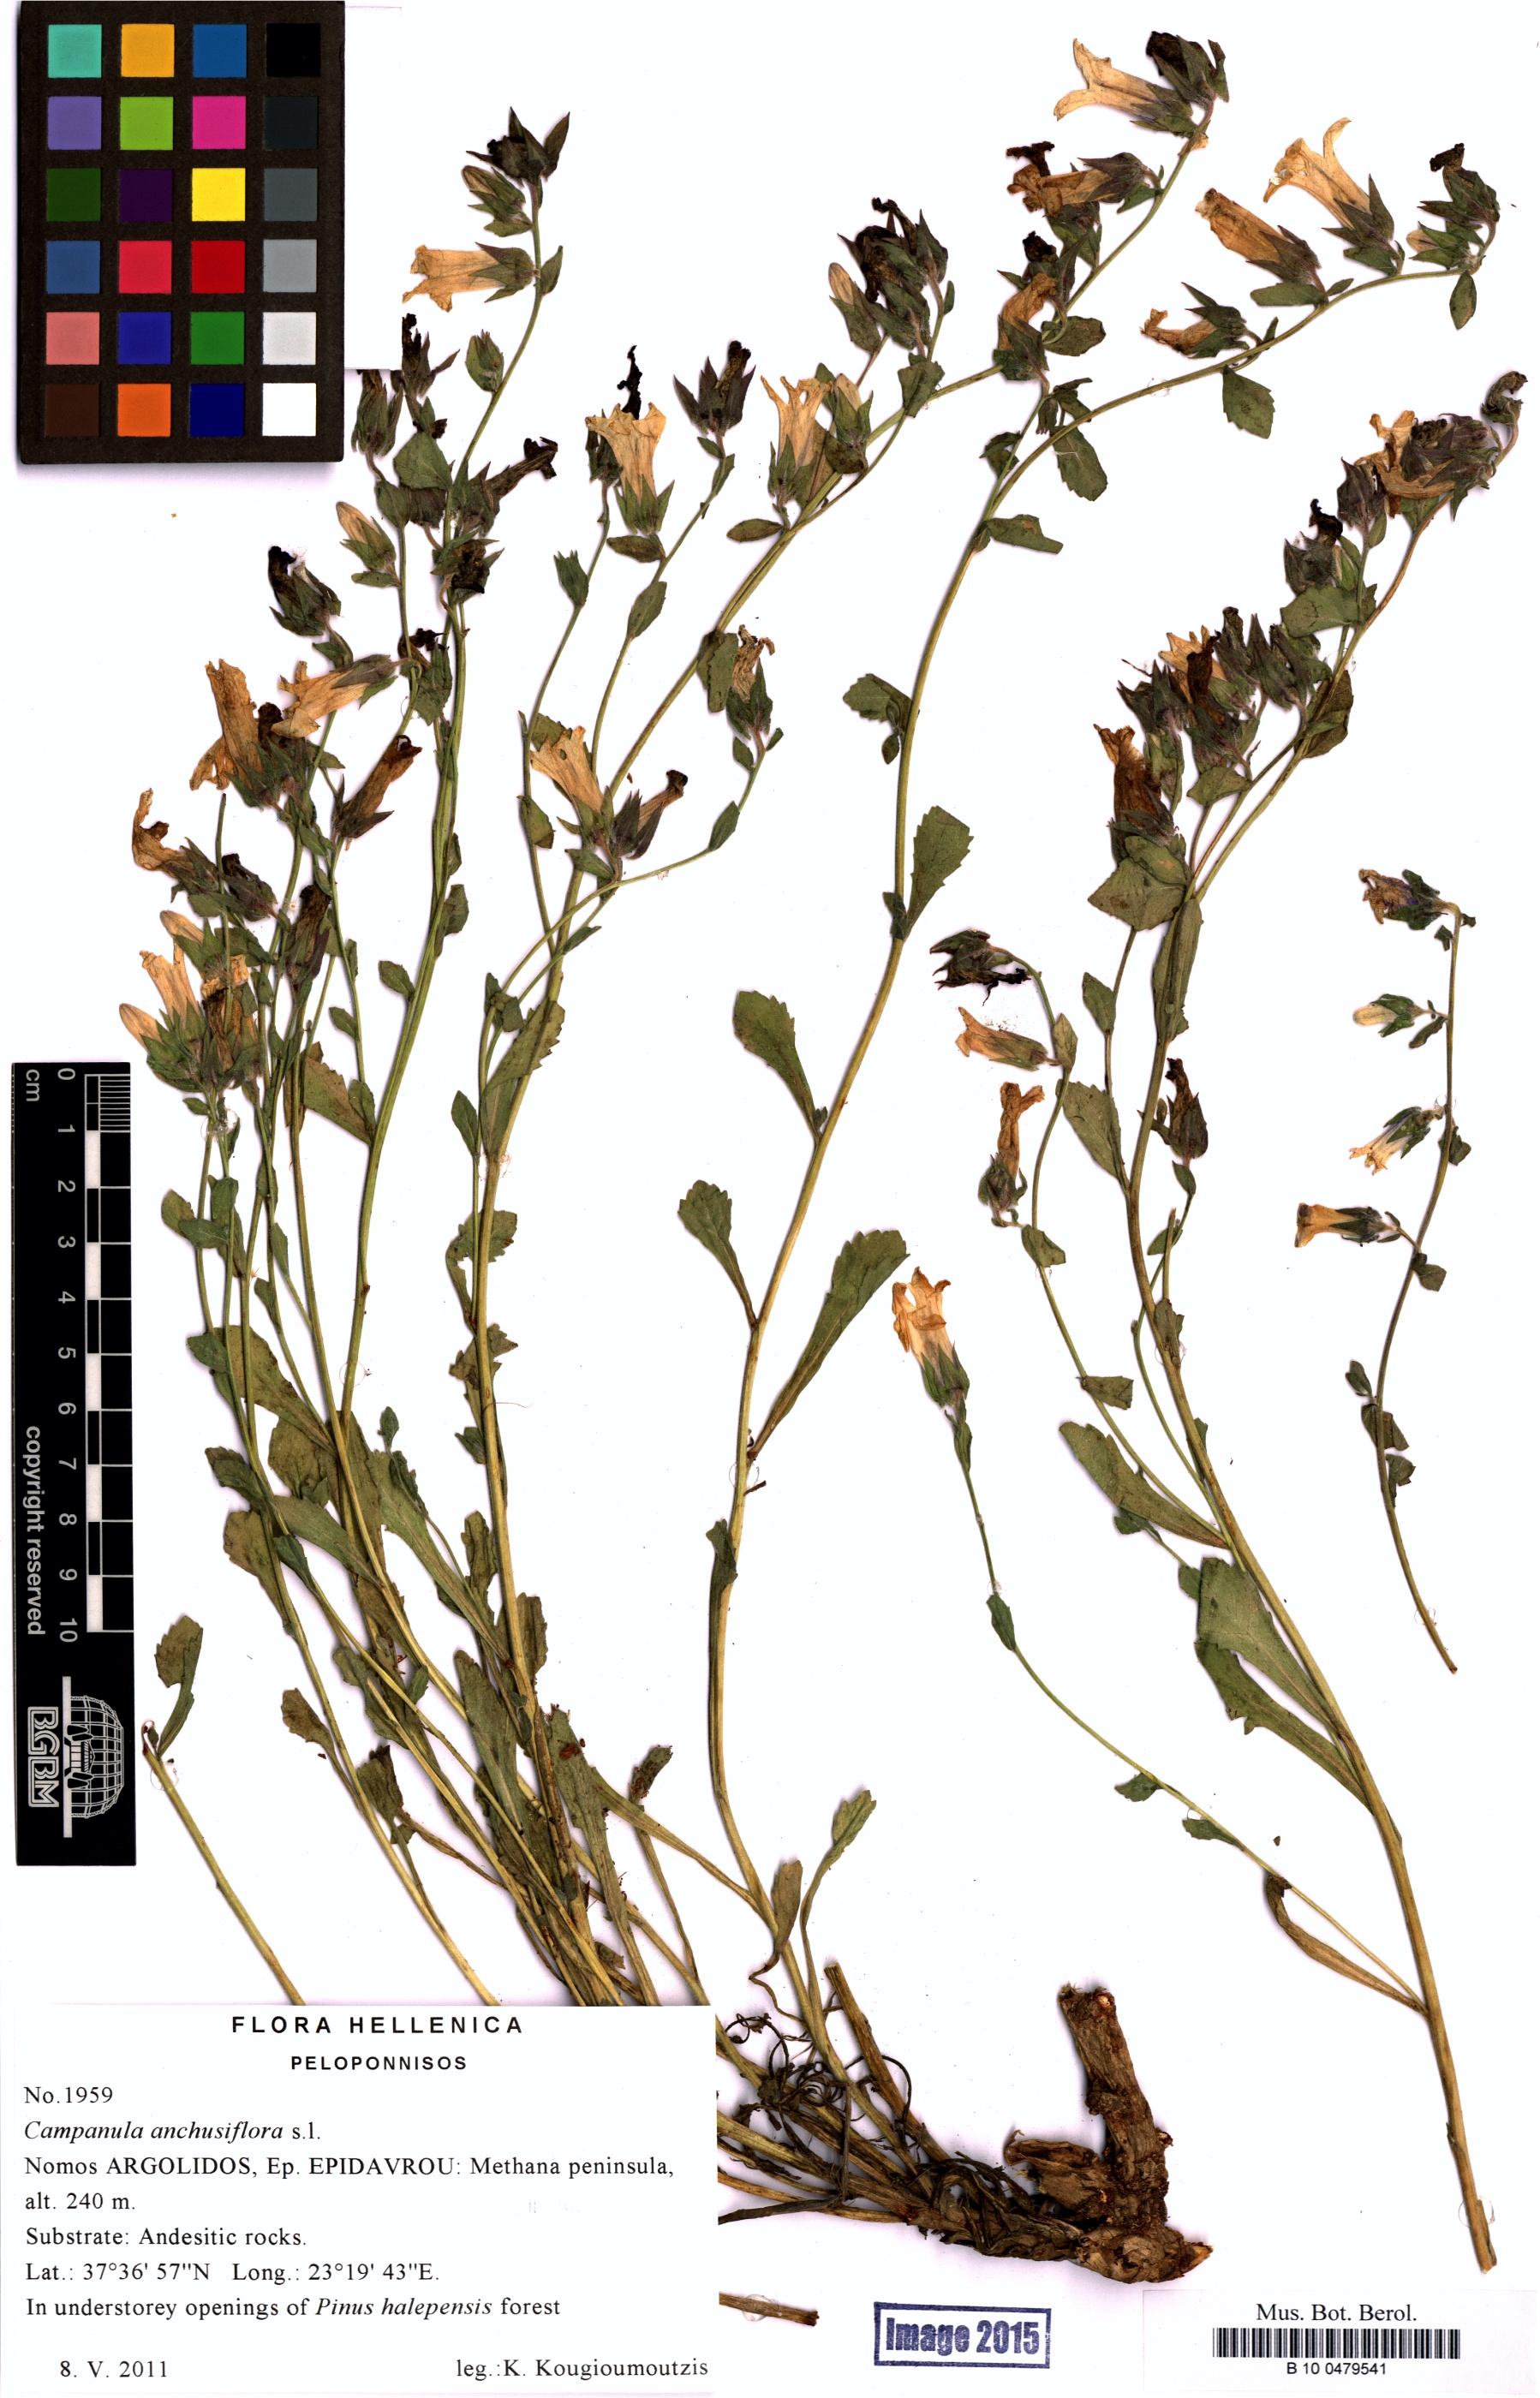 http://ww2.bgbm.org/herbarium/images/B/10/04/79/54/B_10_0479541.jpg